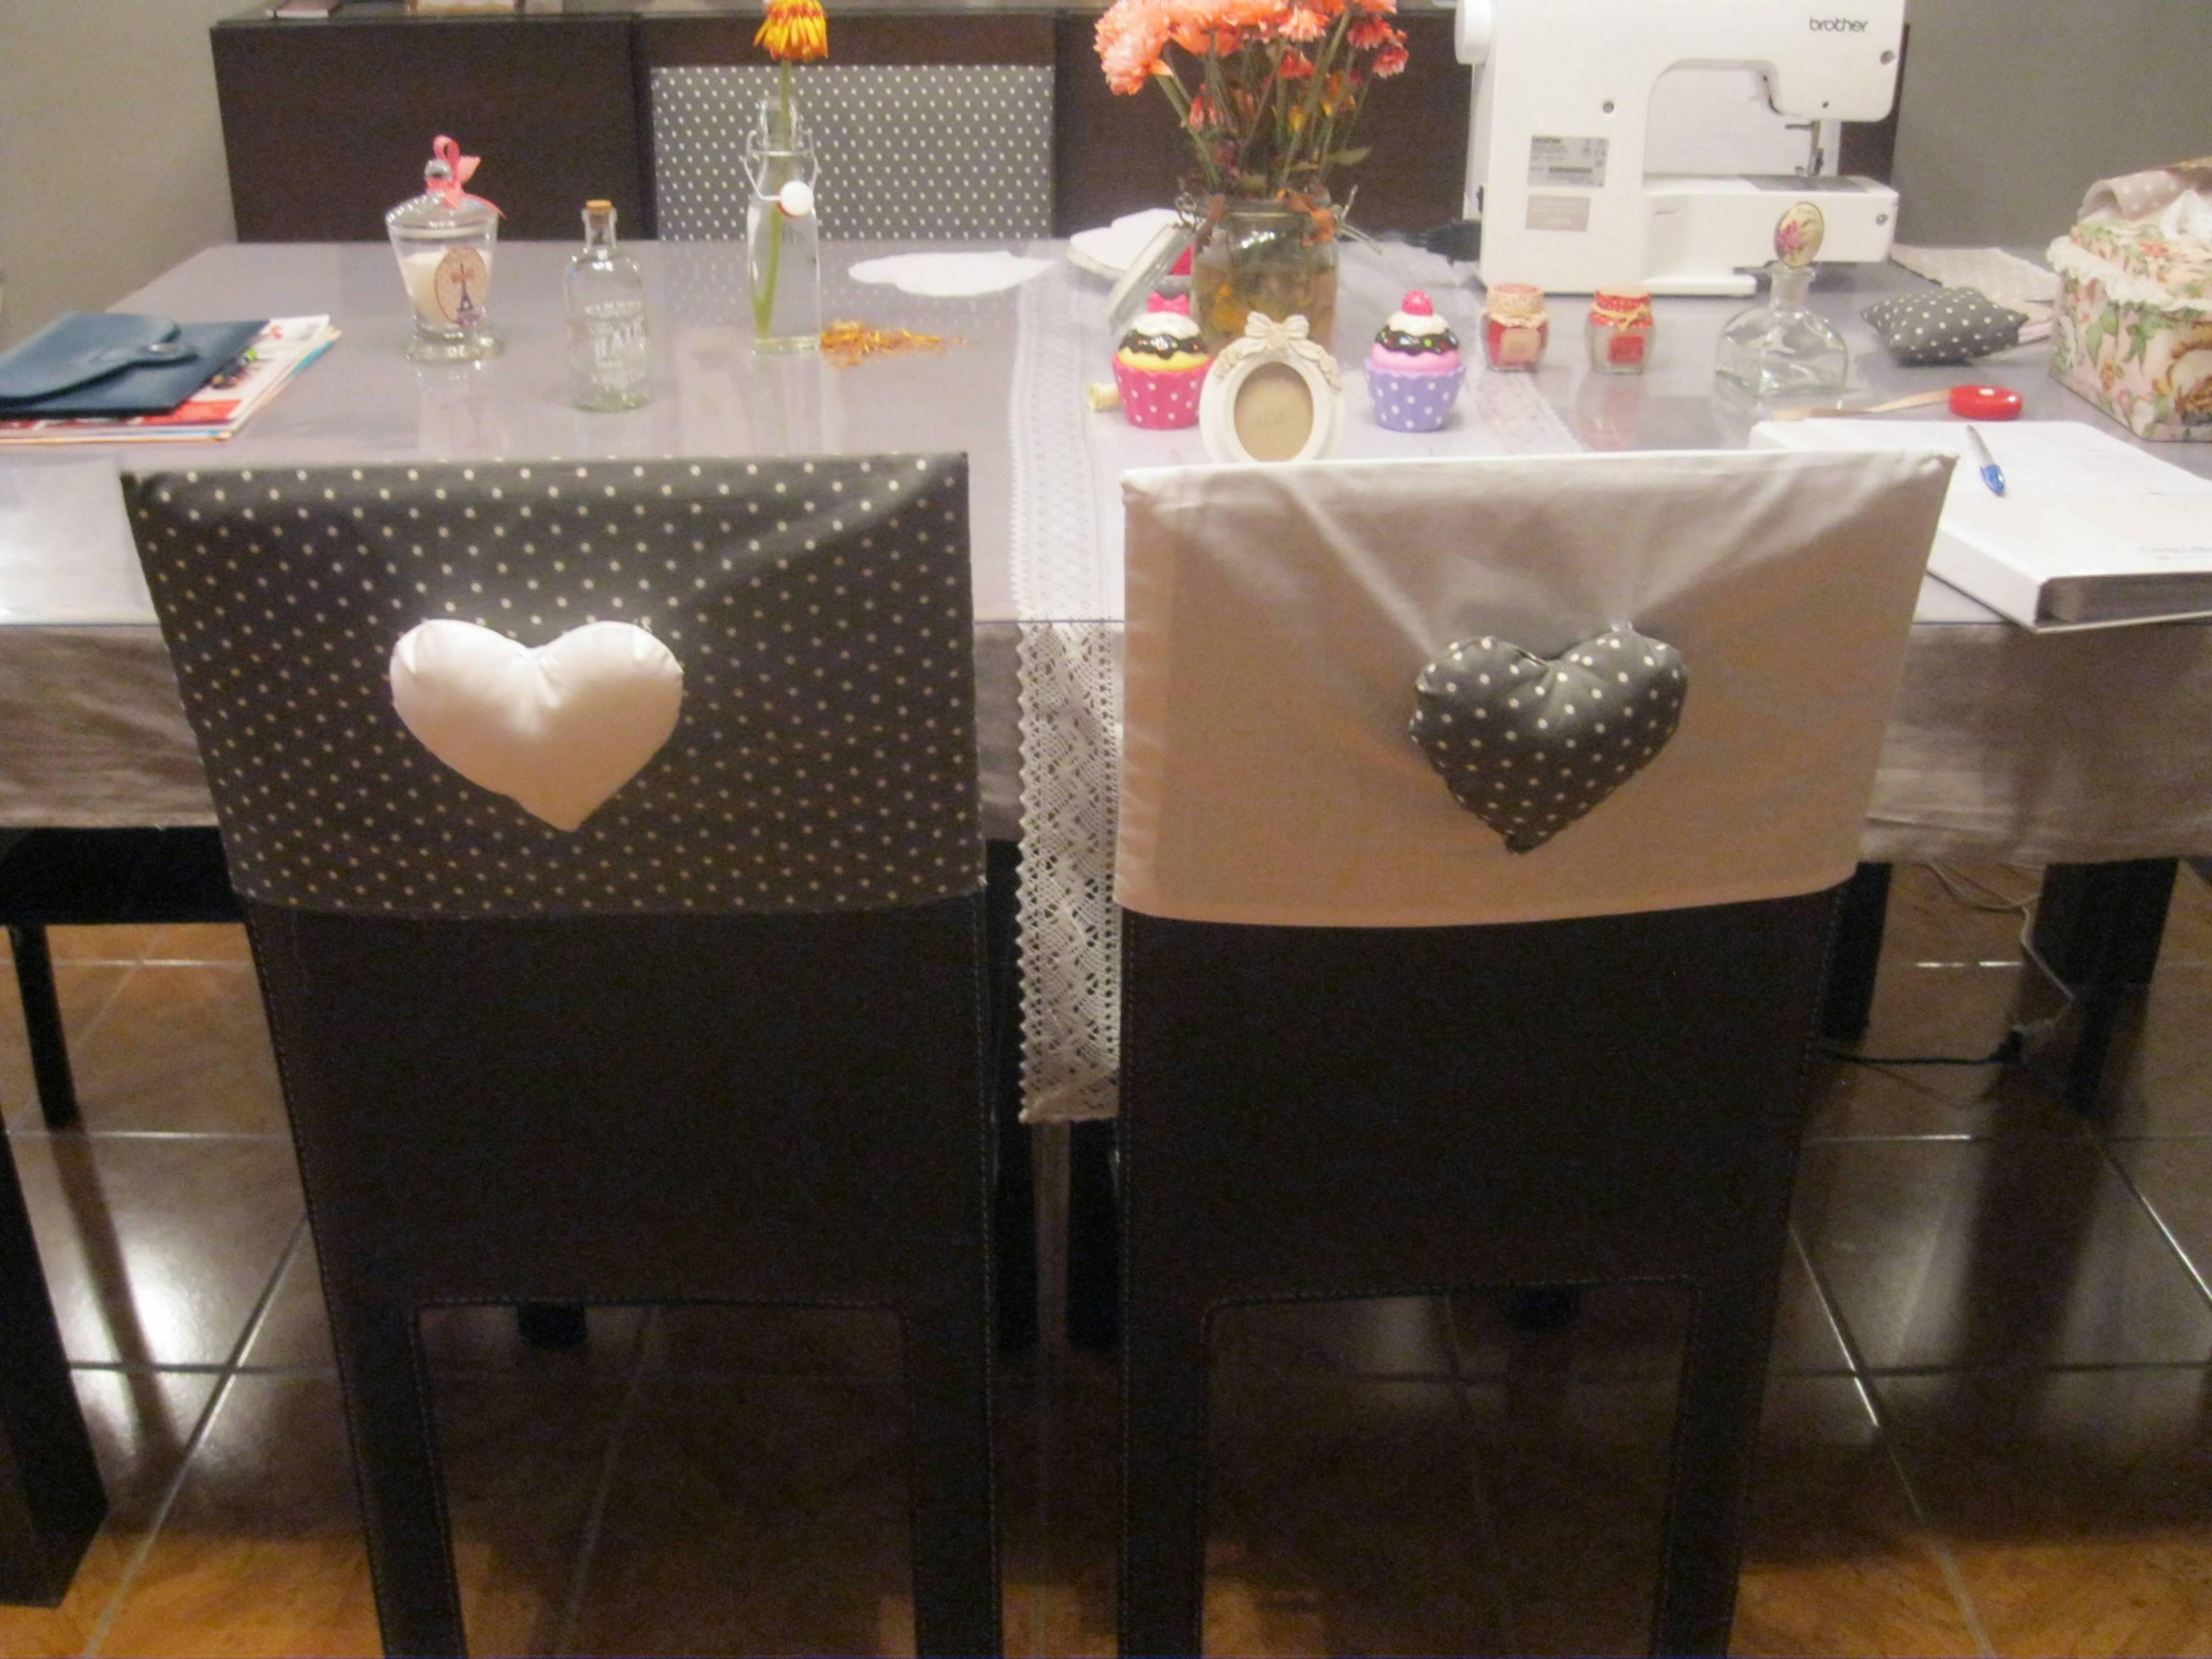 dessus de chaise. Black Bedroom Furniture Sets. Home Design Ideas